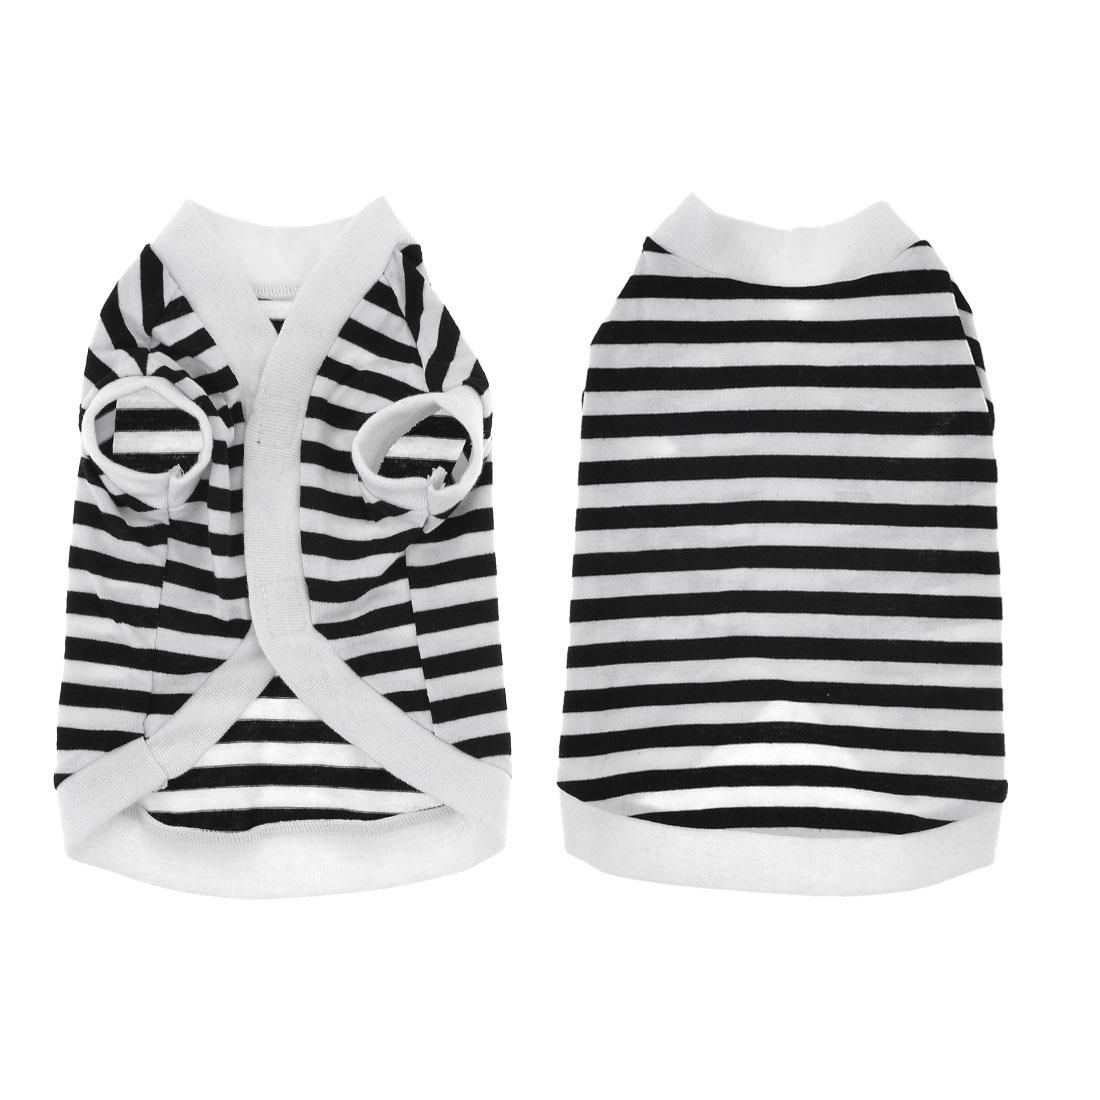 Summer Puppy Yorkie Hook Loop Closure Striped Tee Shirt Apparel White Black M